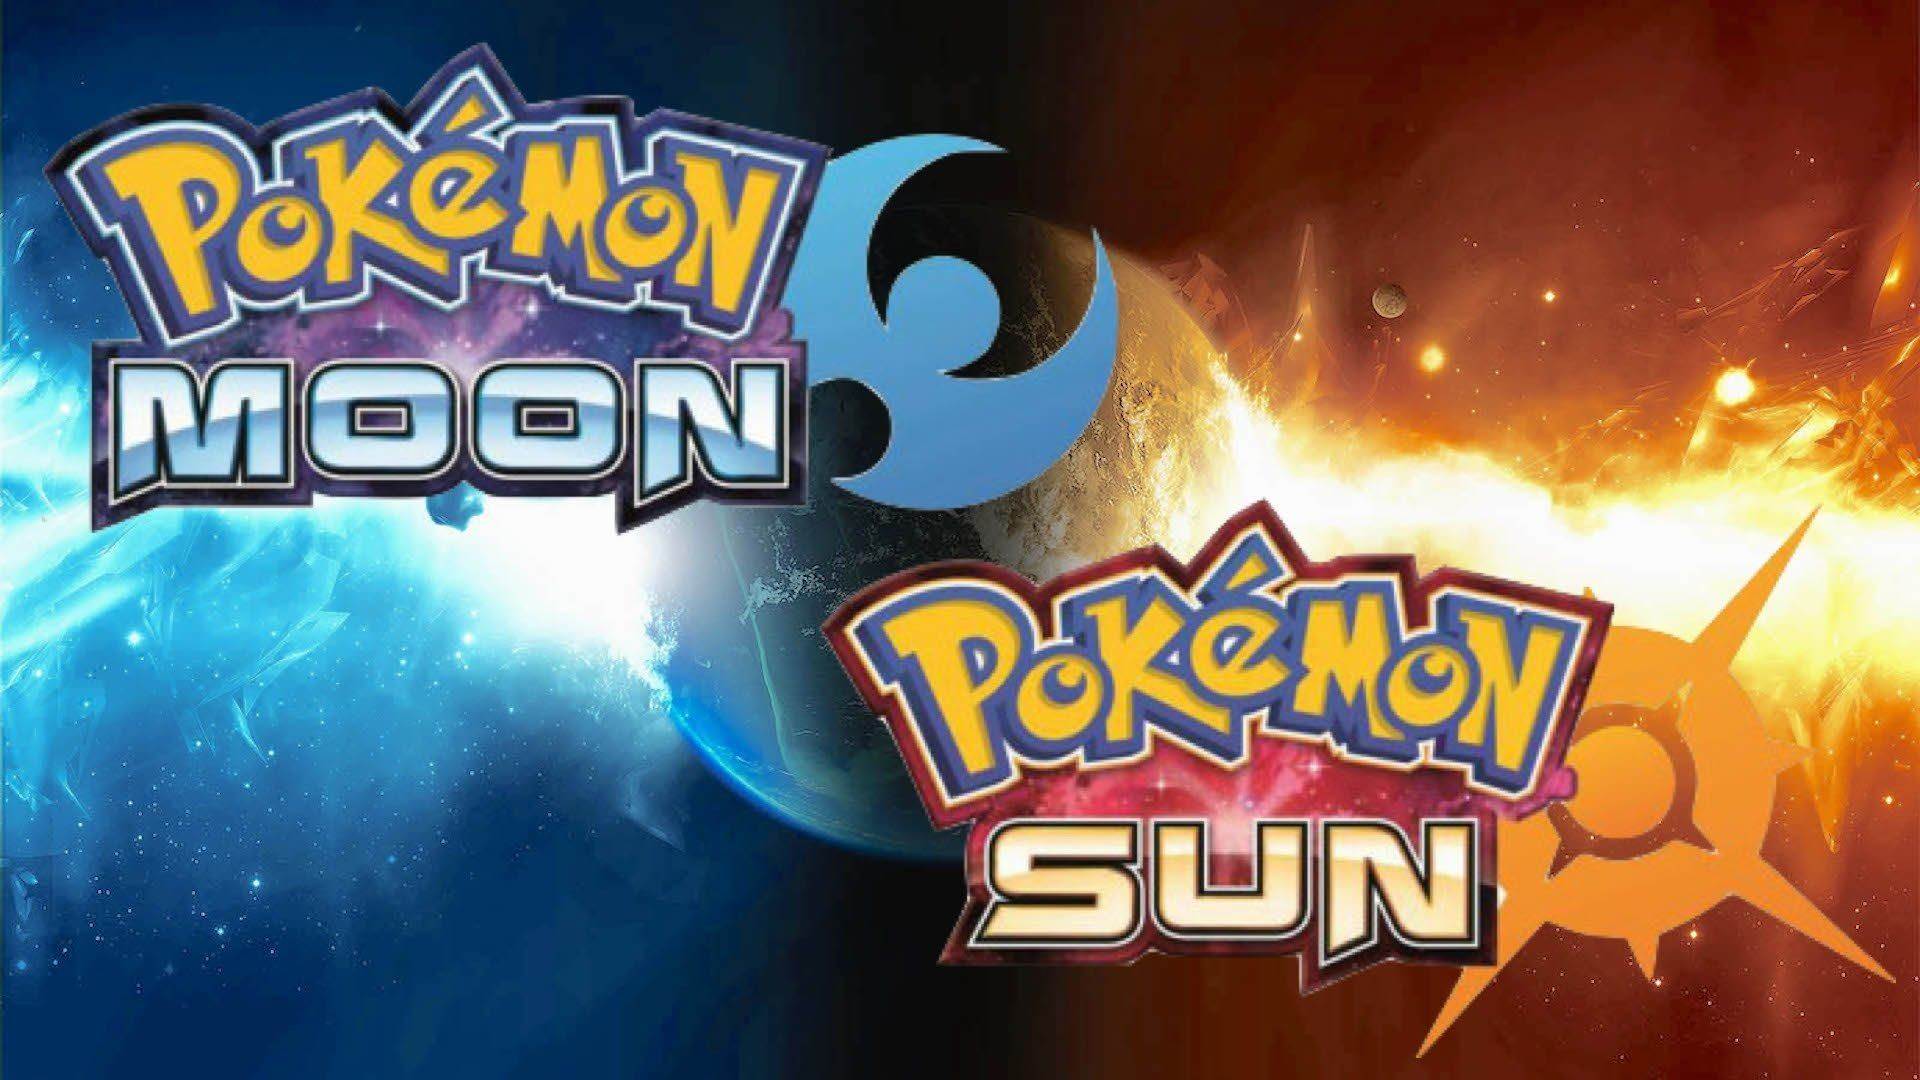 Pokémon Sun Wallpapers by Glen Lewis #9